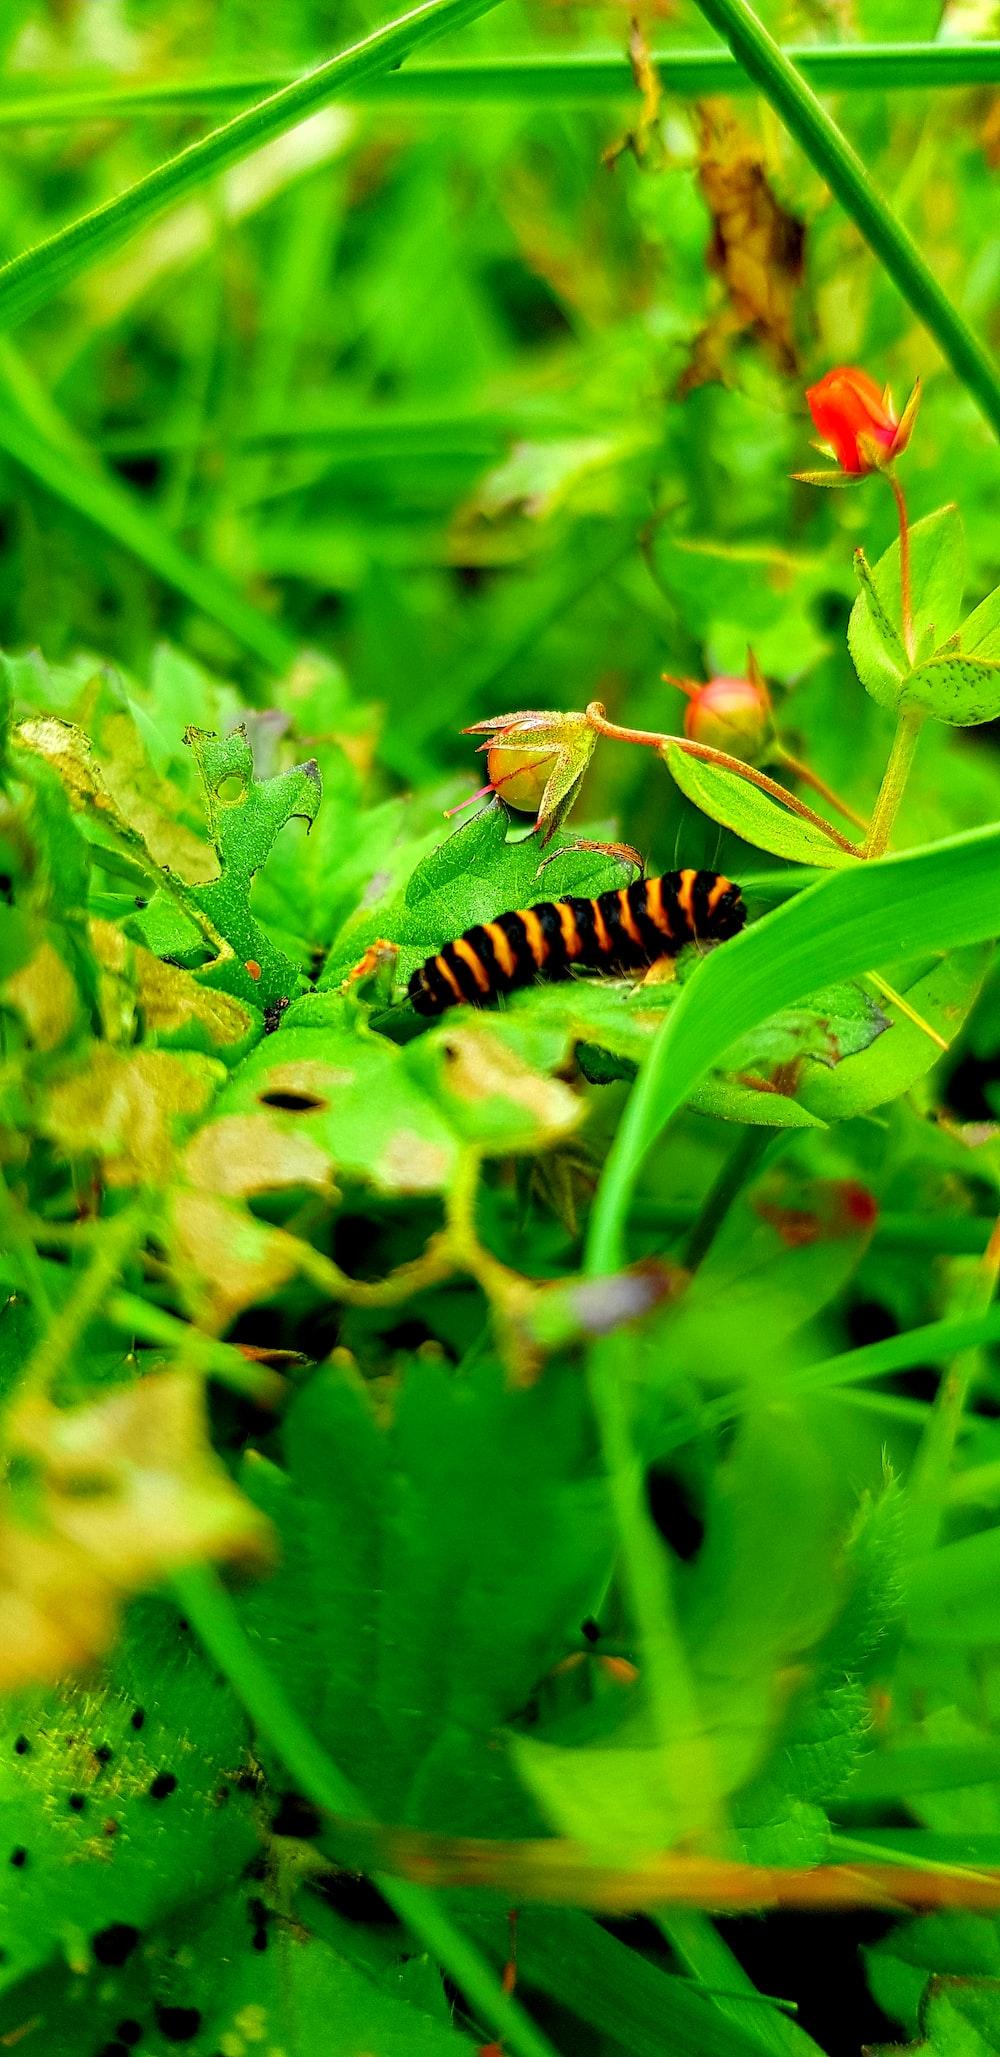 brown worm on leaf